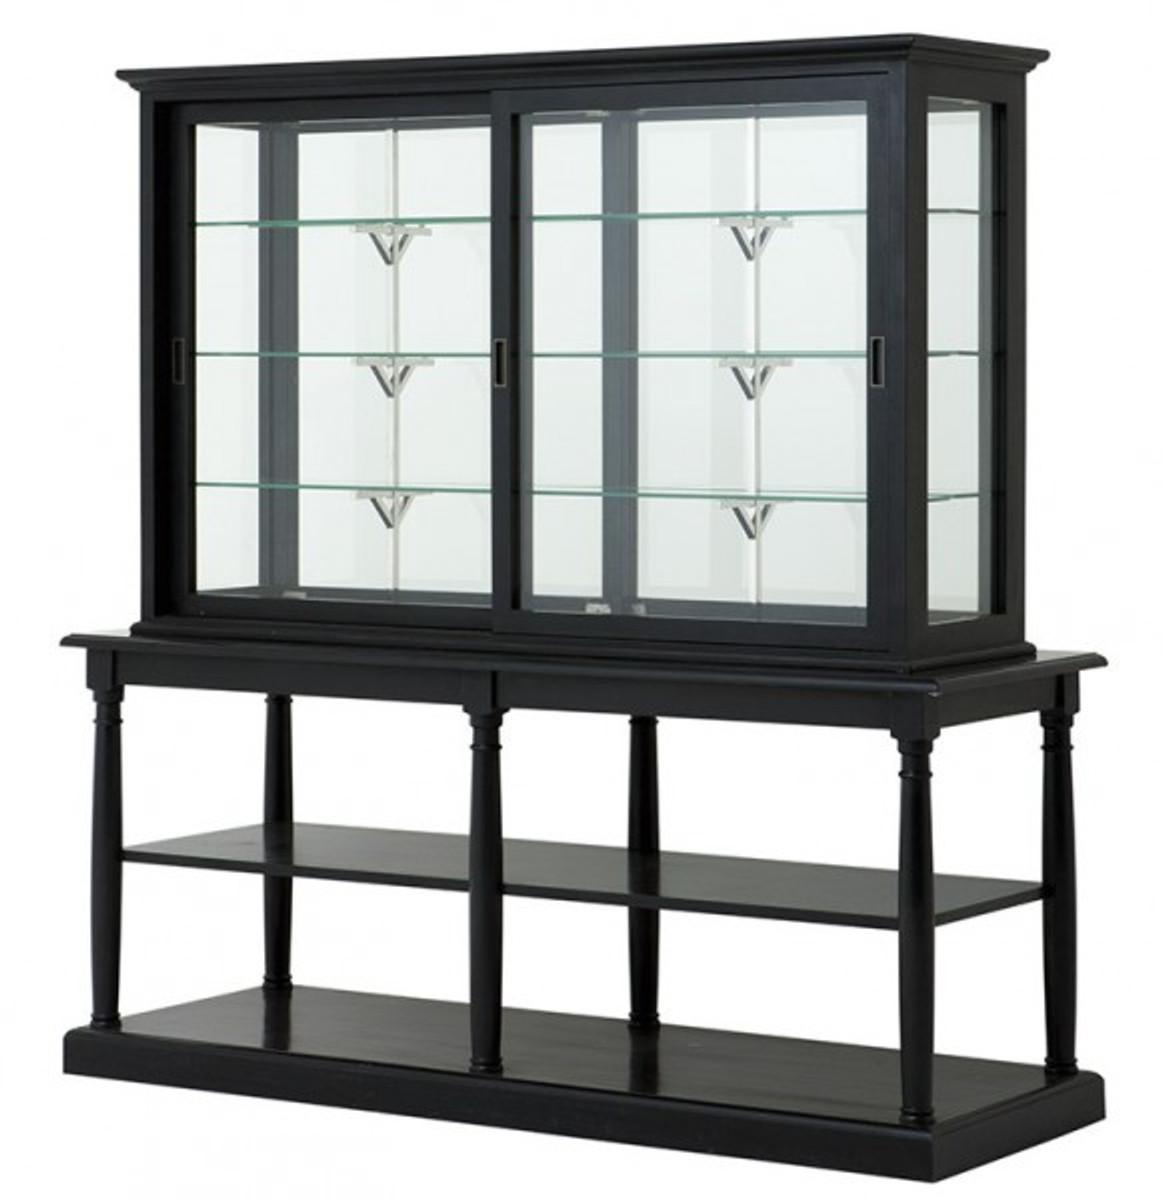 Casa Padrino Luxus Glas Vitrinen Schrank Schwarz Massivholz